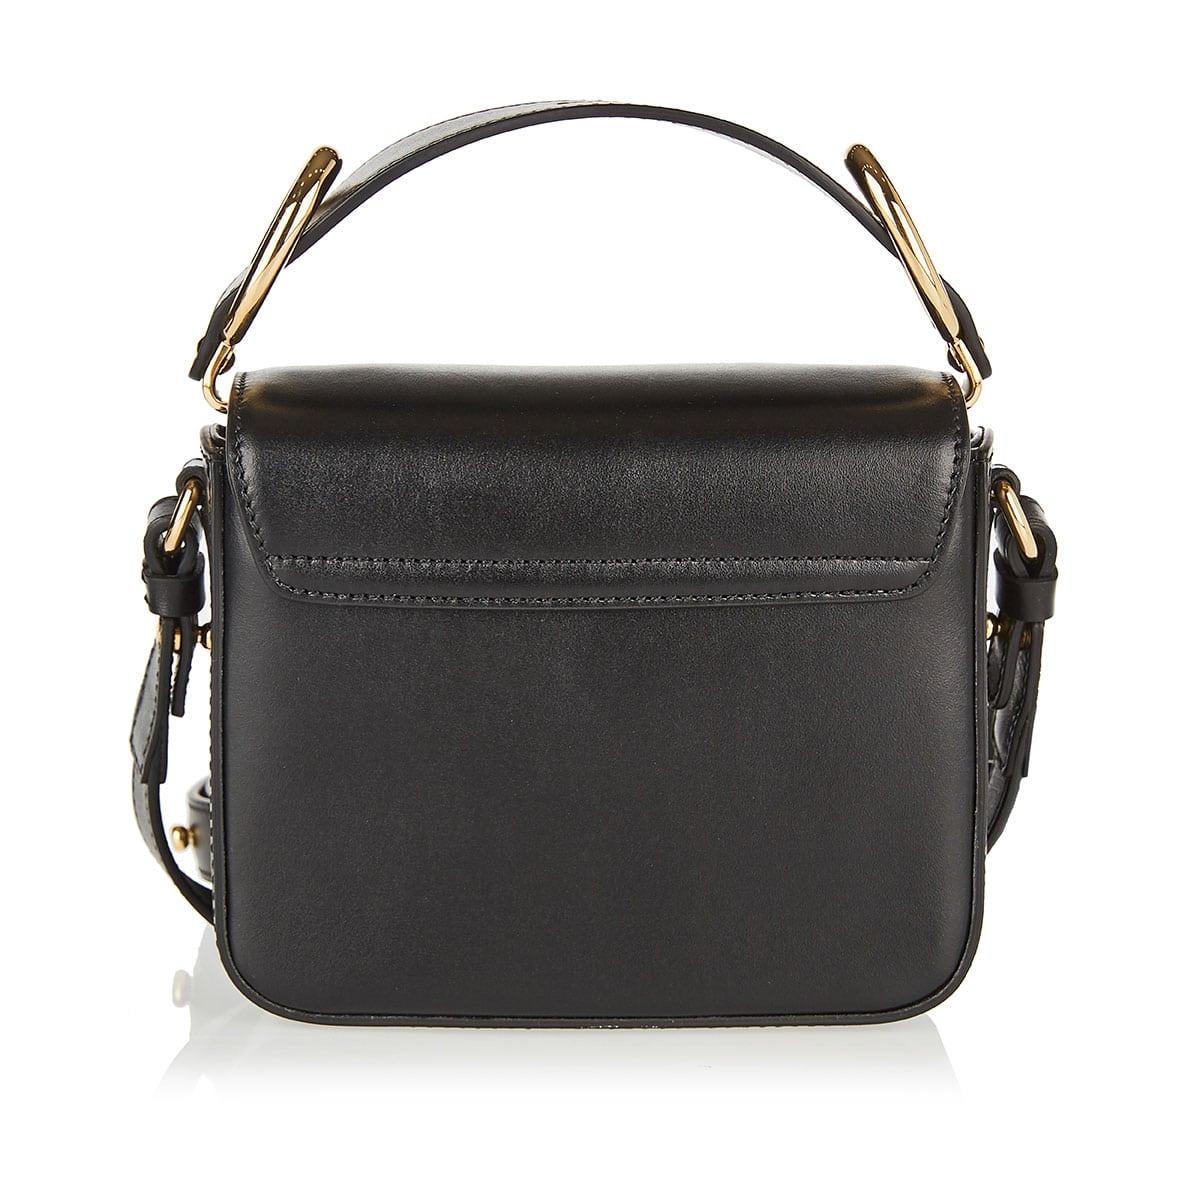 Mini Chloé C leather bag